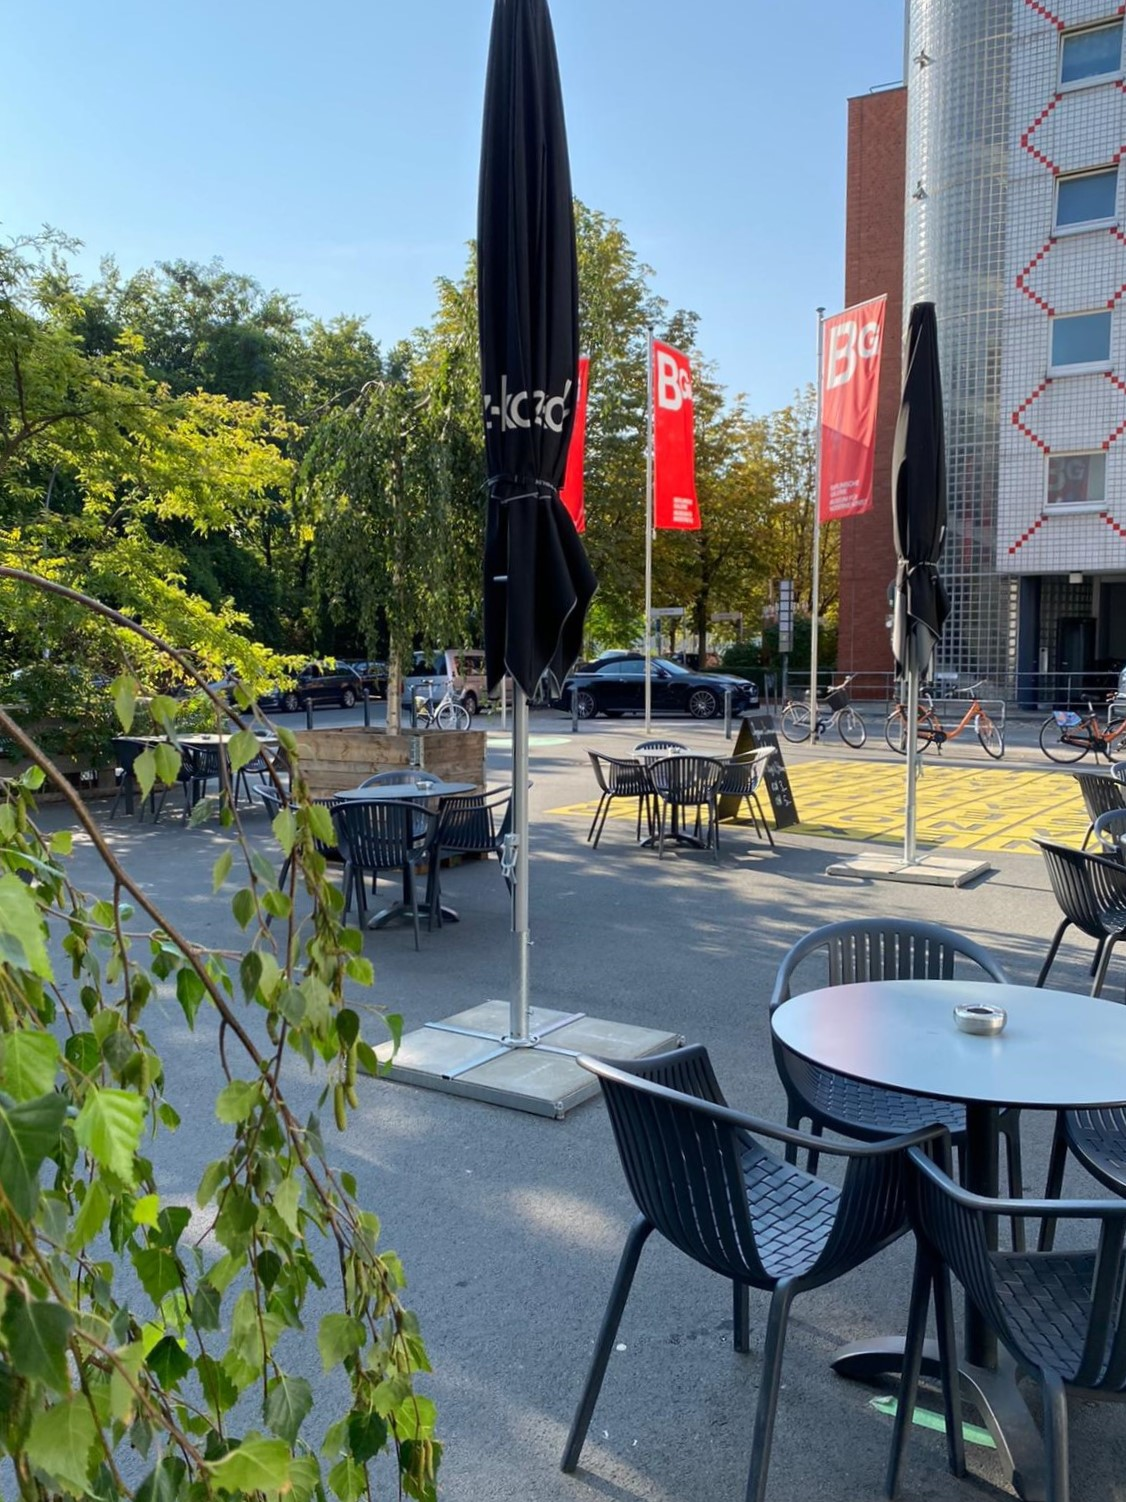 Cafe-Dix-in-Kreuzberg-mit-Terrasse-2